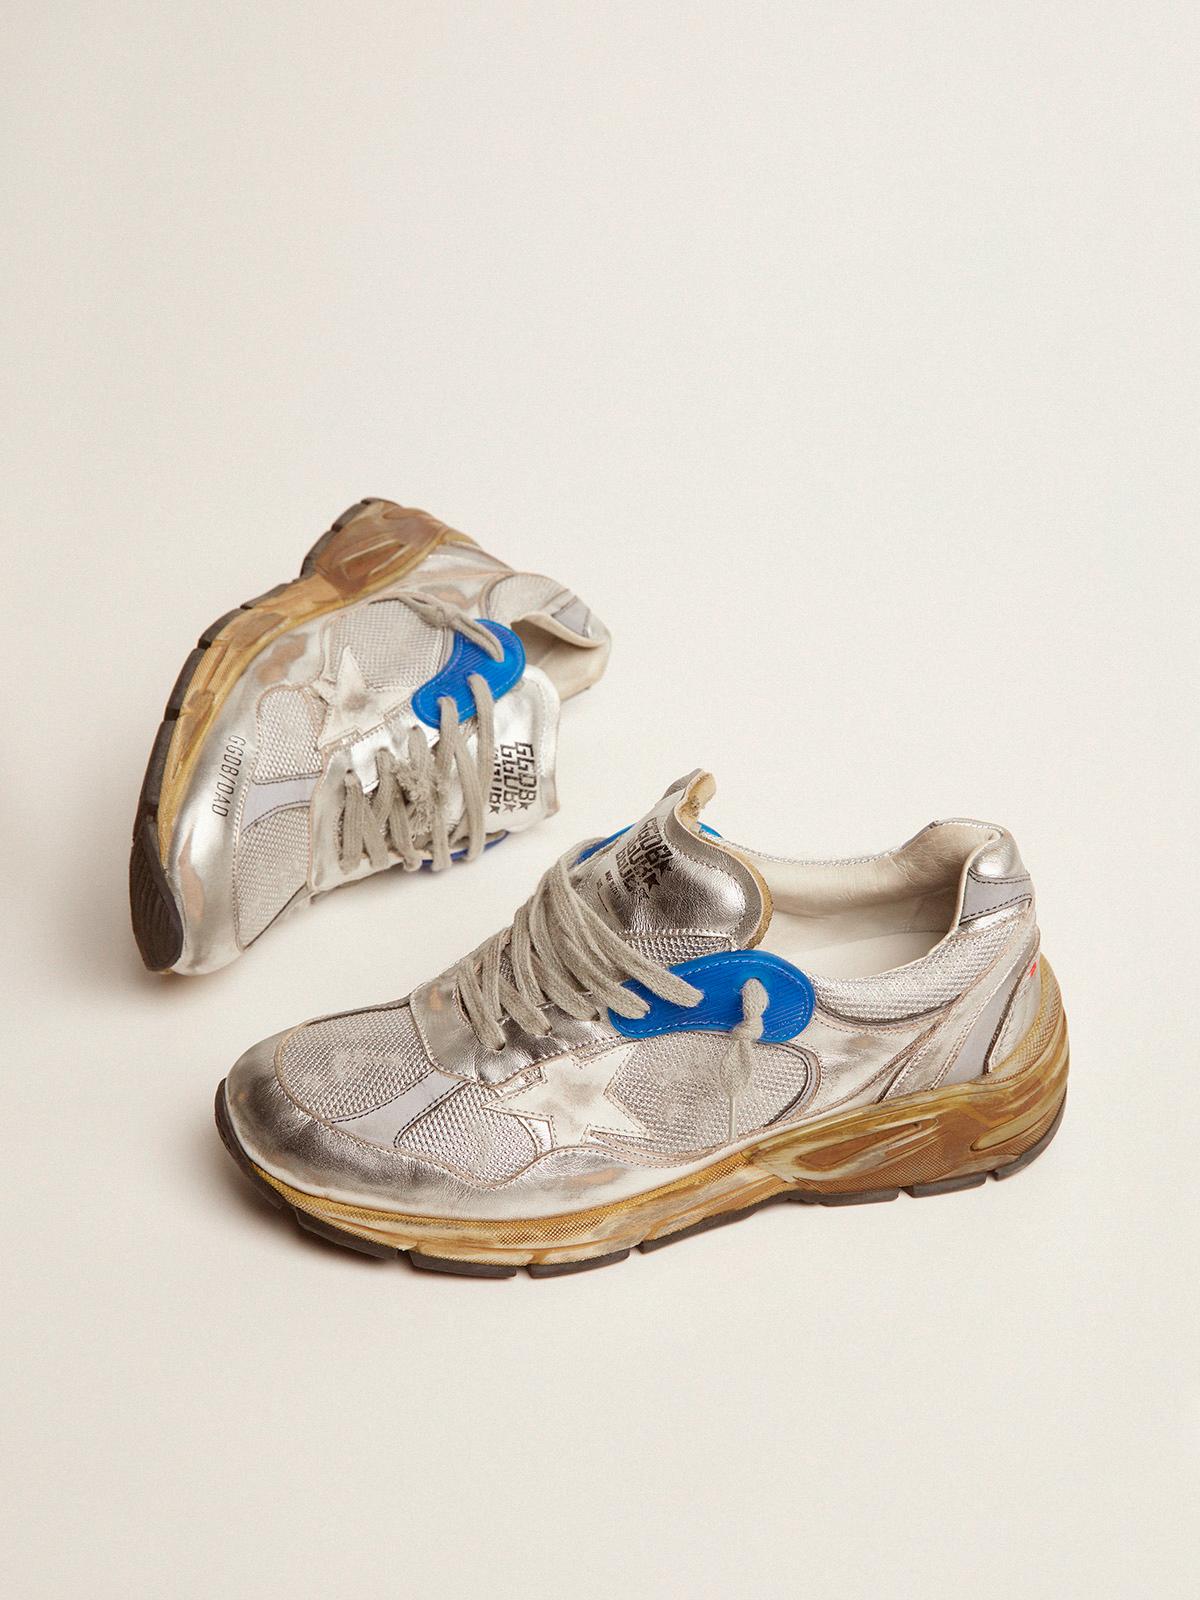 Golden Goose - Sneakers Dad-Star donna argentate in